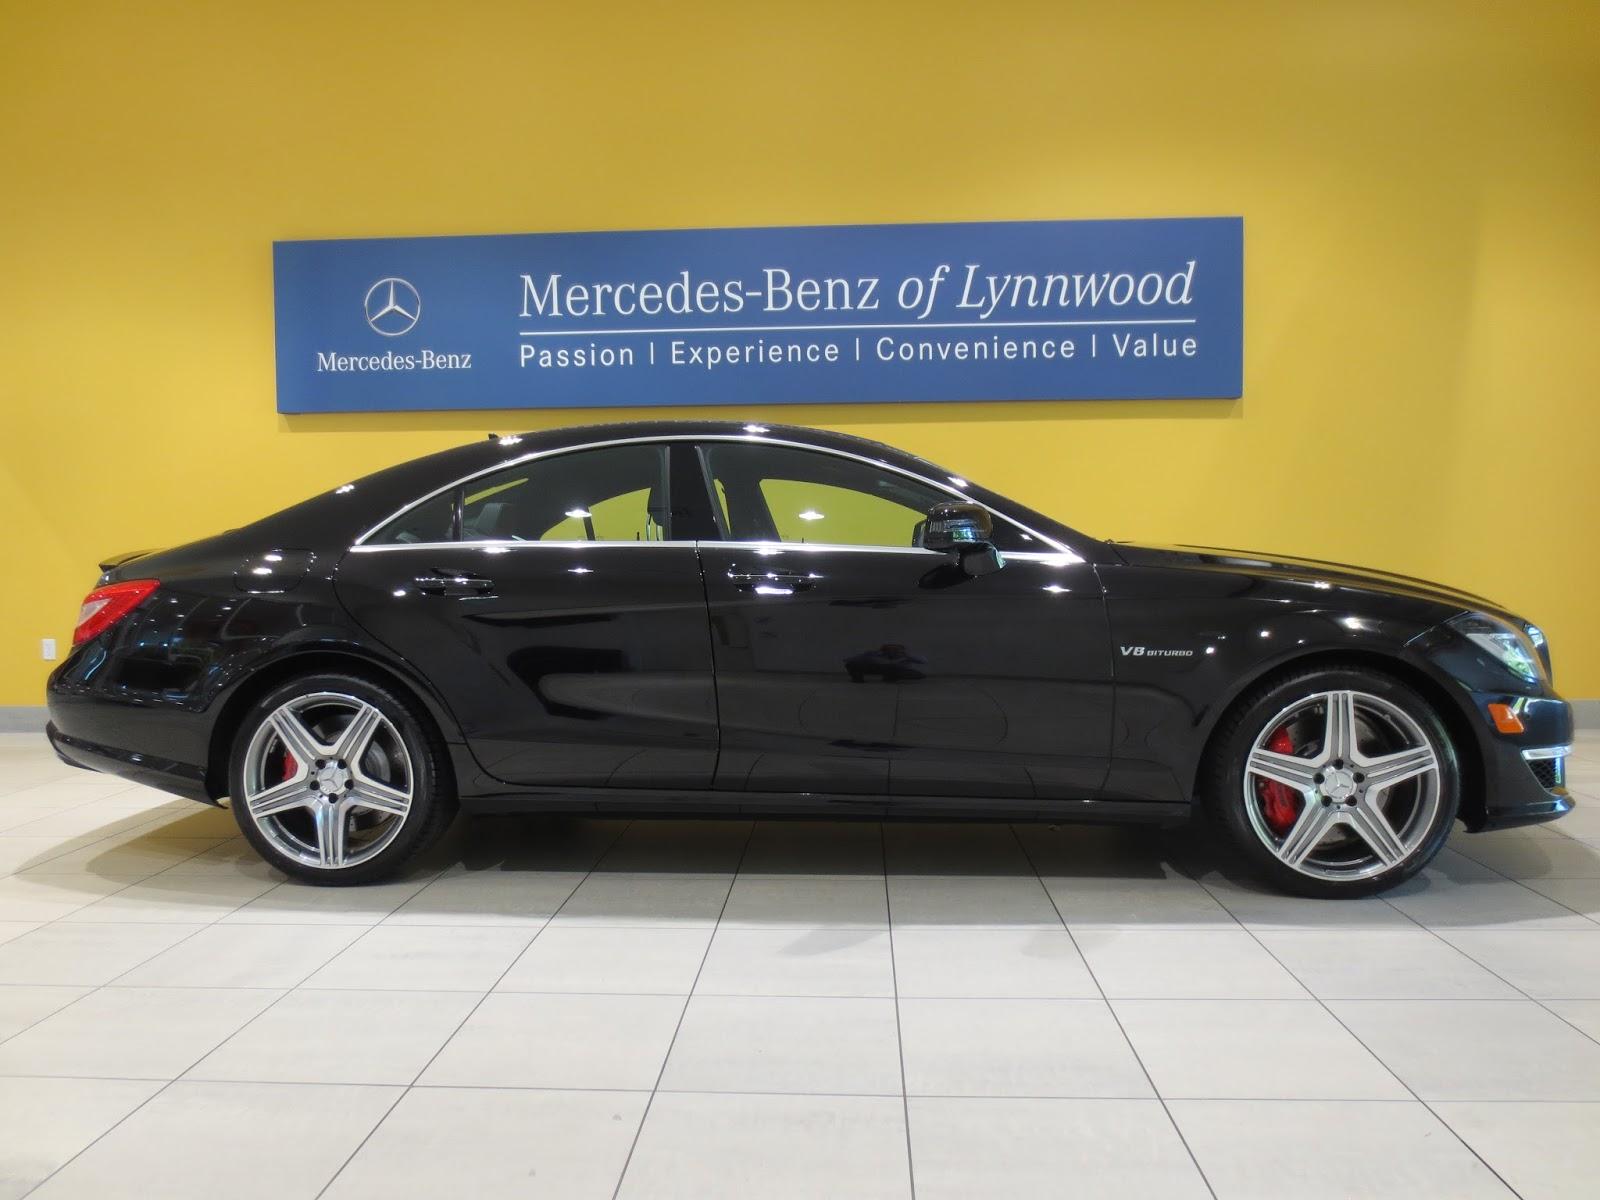 Mercedes Benz Of Lynnwood Blog